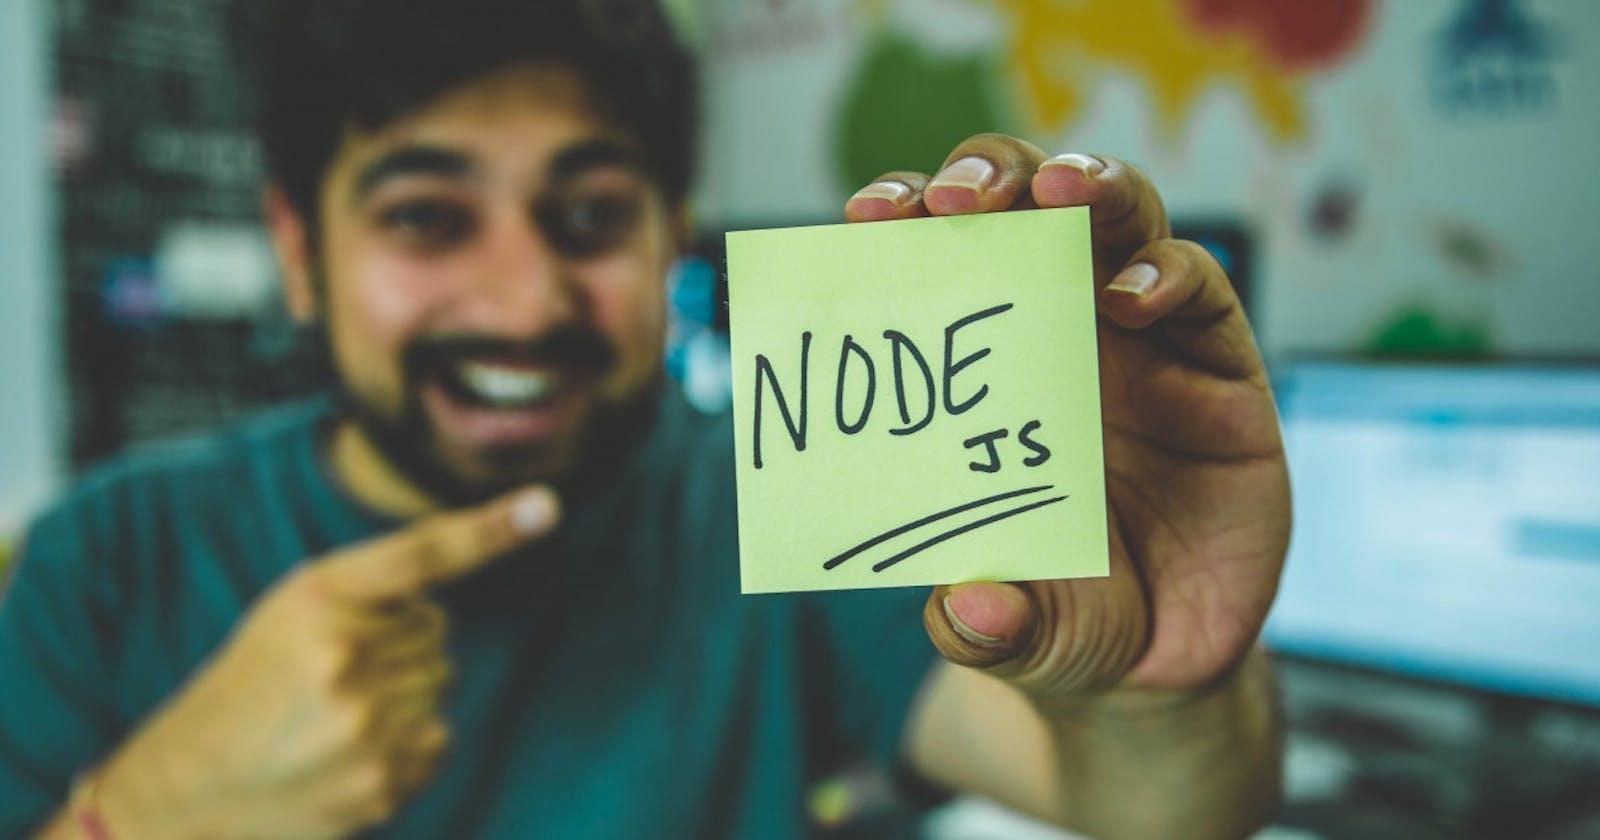 Installing node.js on linux using snap